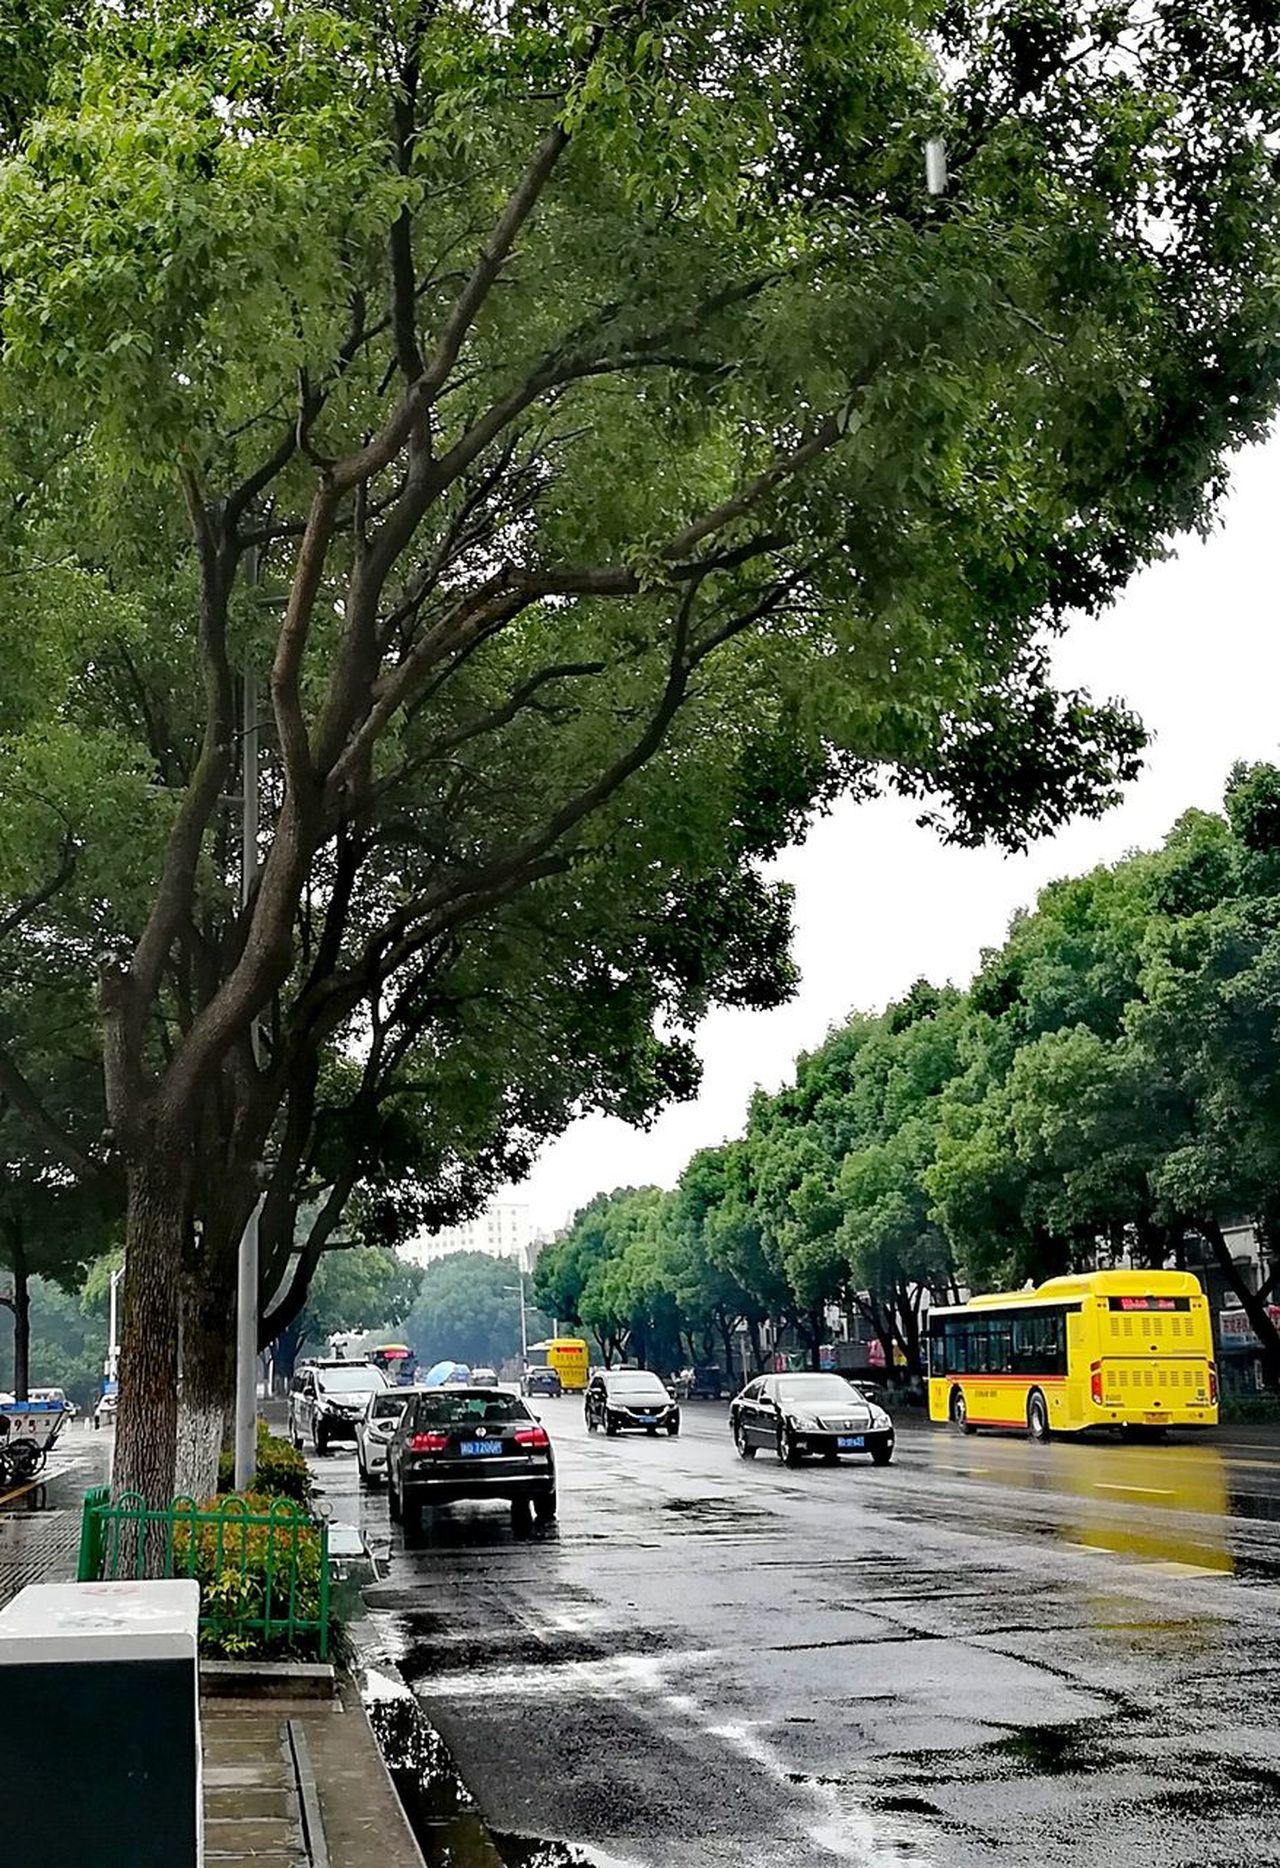 Tree Car Land Vehicle Transportation Road Trees Nature City Keqiao Shaoxing